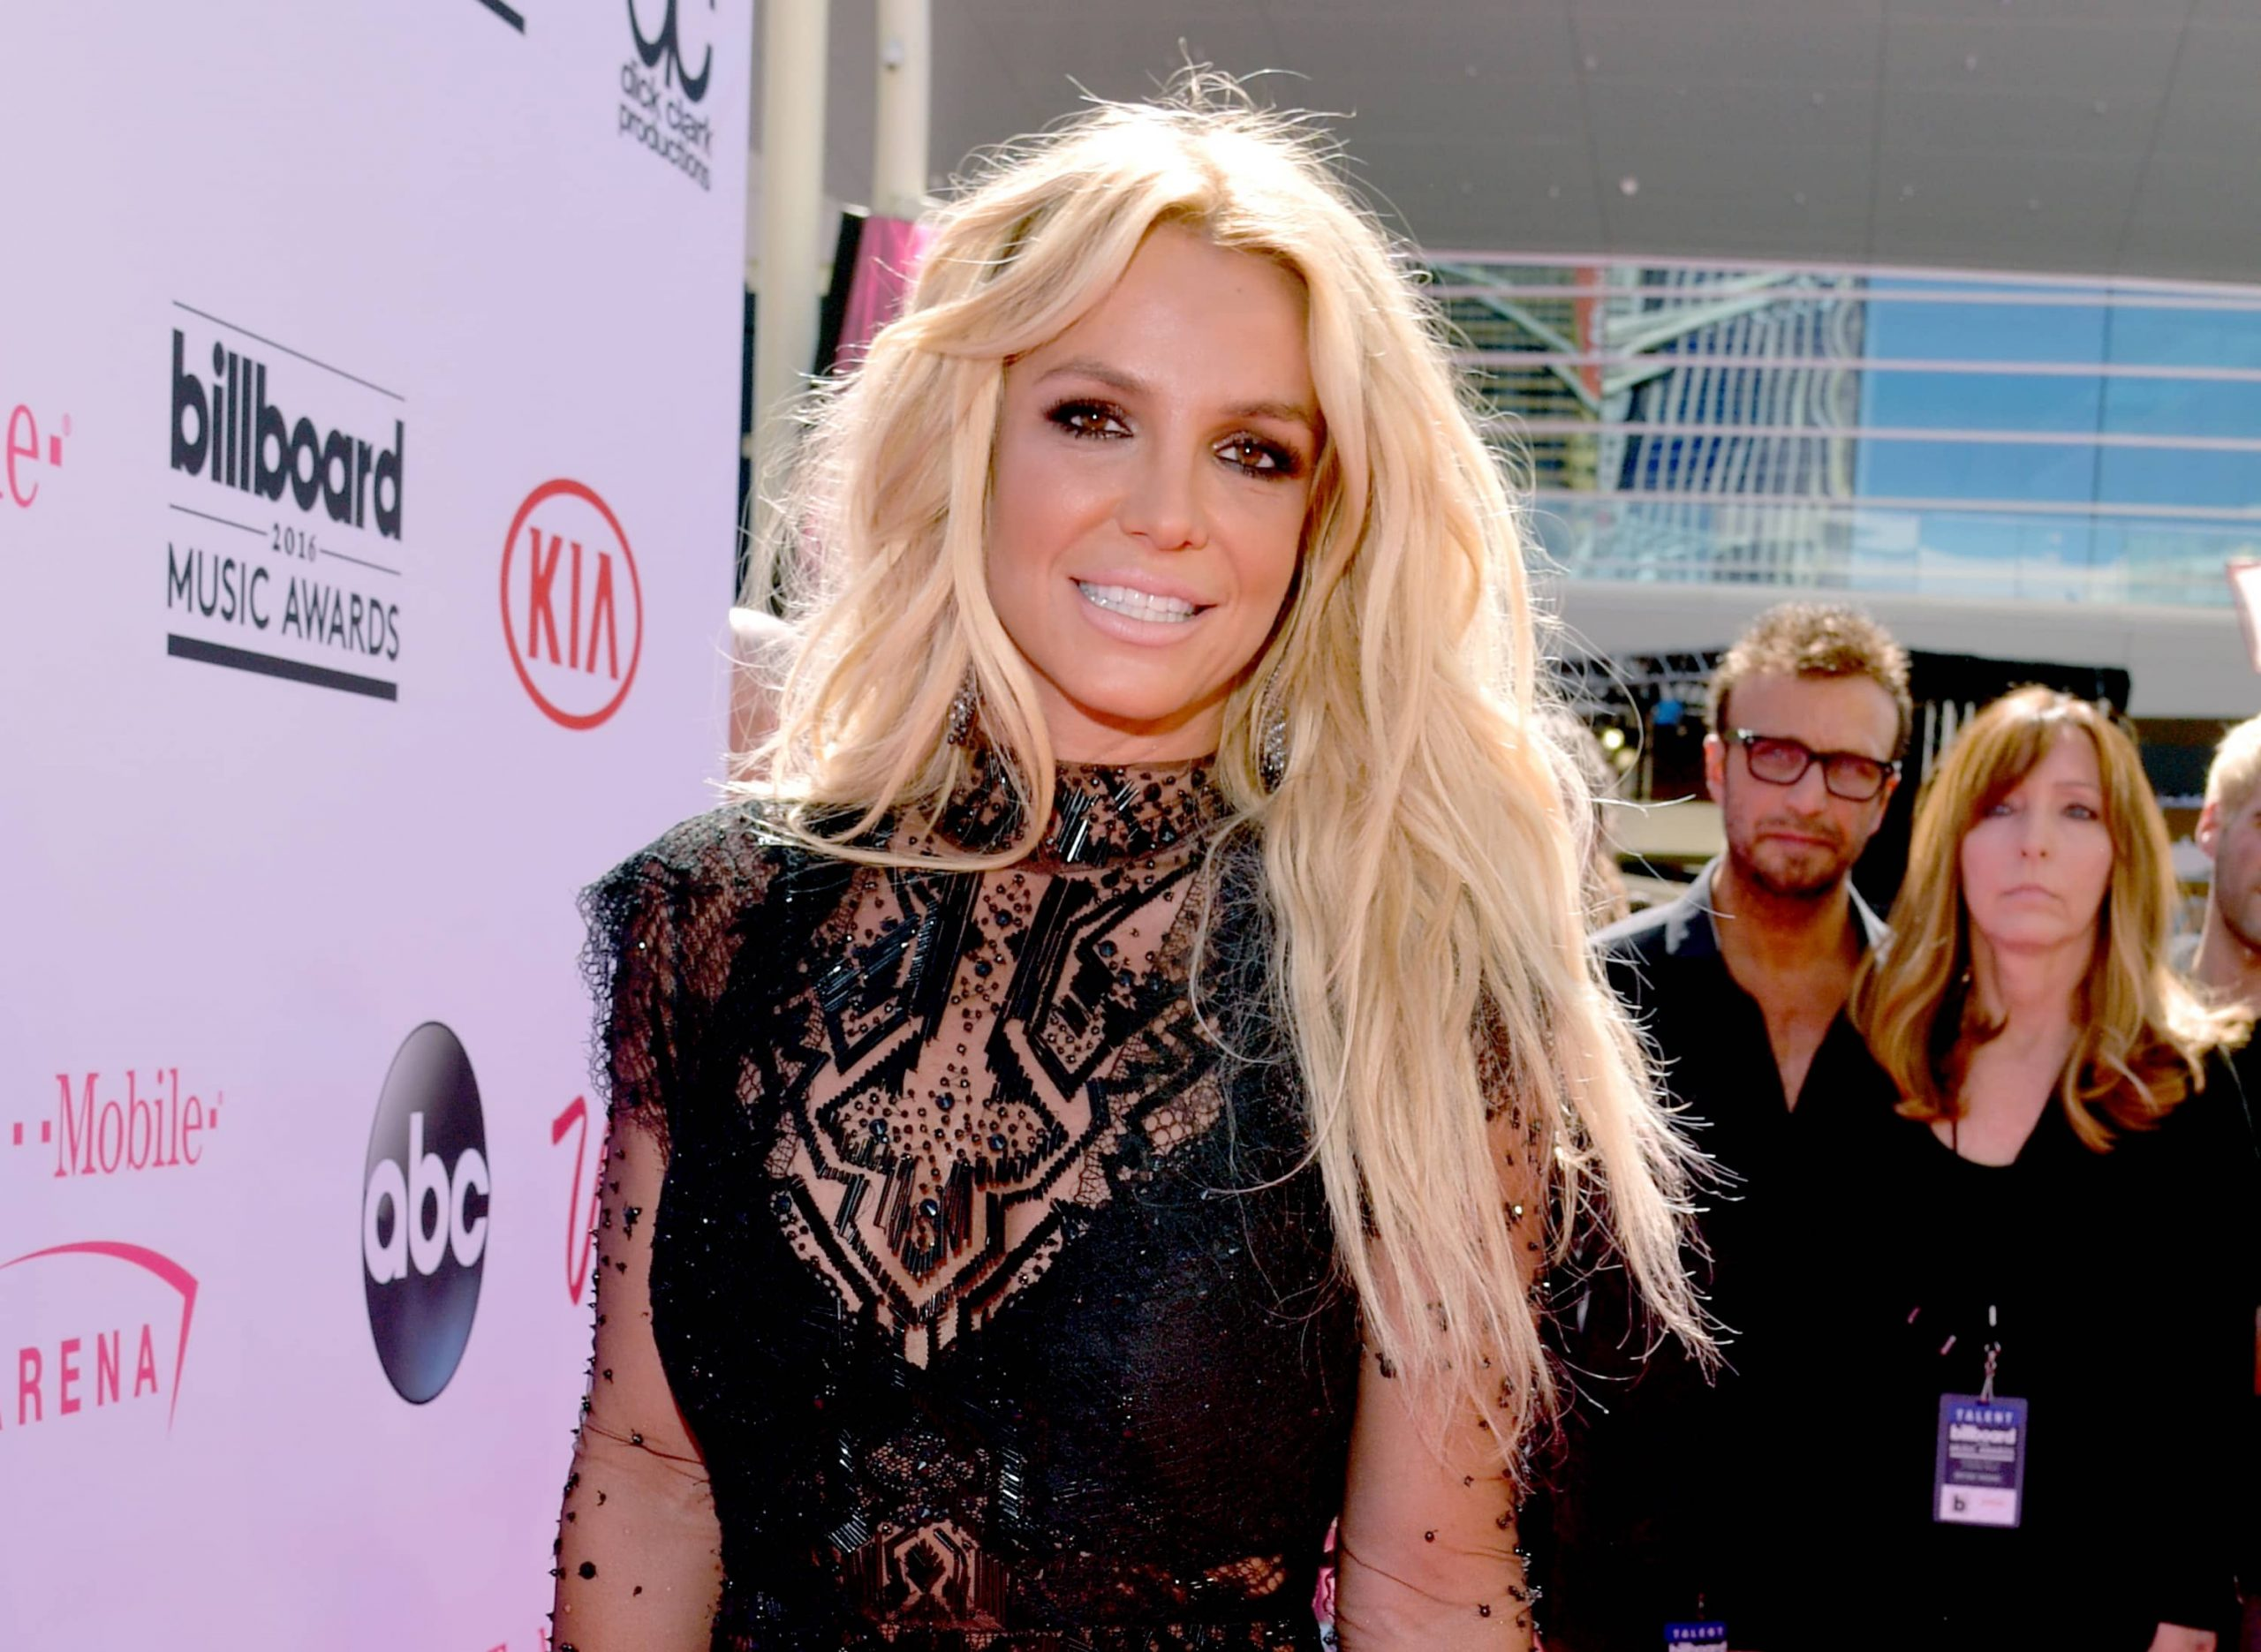 Britney Spears' conservatorship case prompts bipartisan 'Free Britney' bill